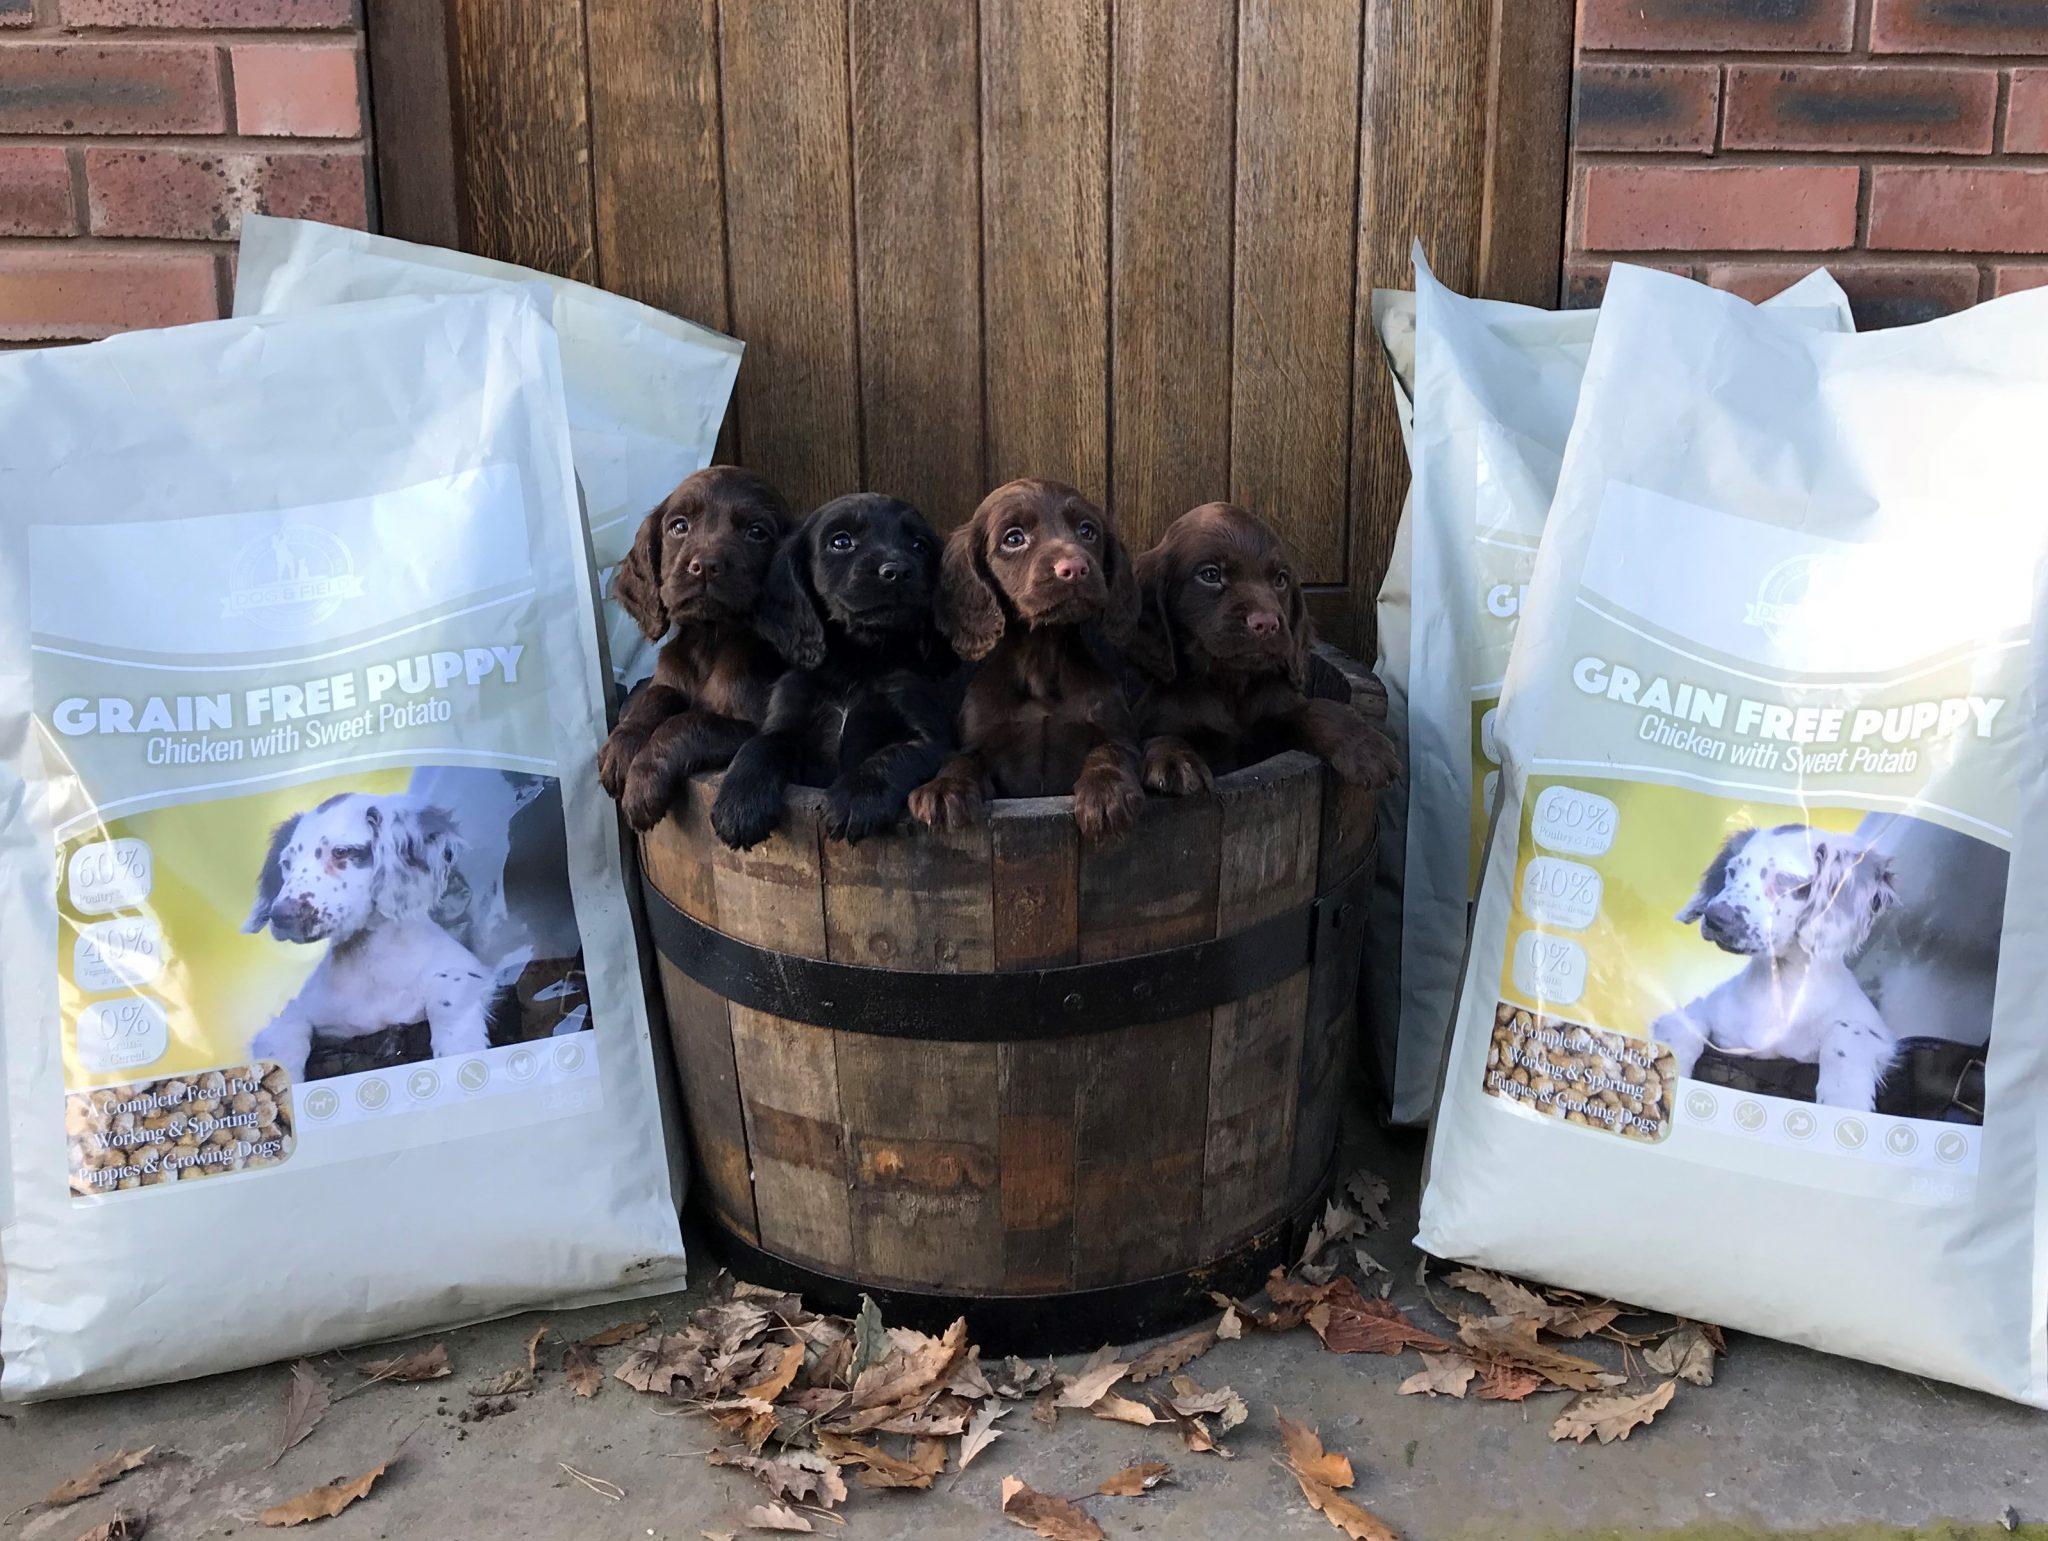 Dog and Field Hypoallergenic Premium Puppy Food